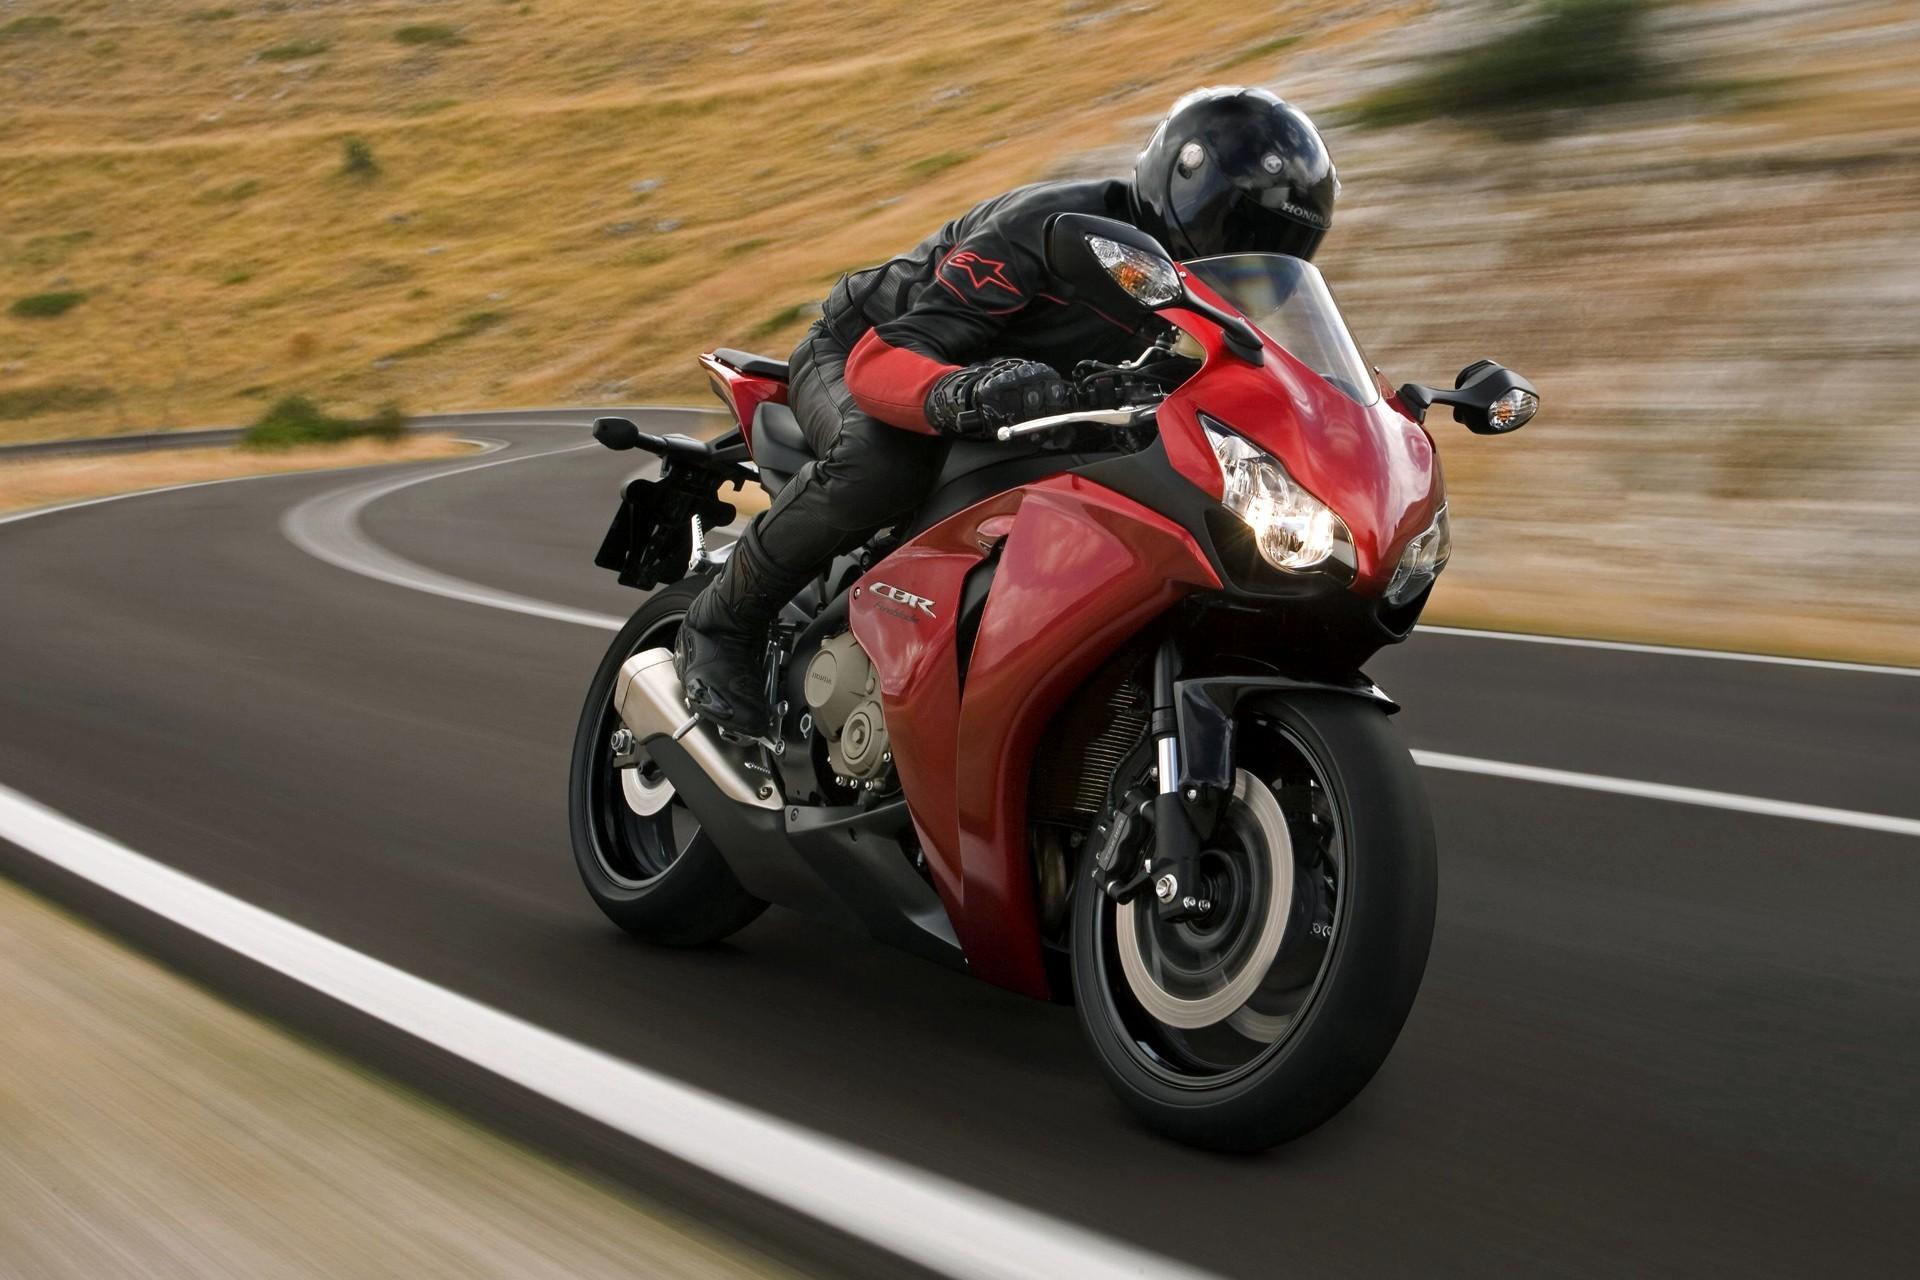 Res: 1920x1280, Honda CBR1000RR free wallpapers